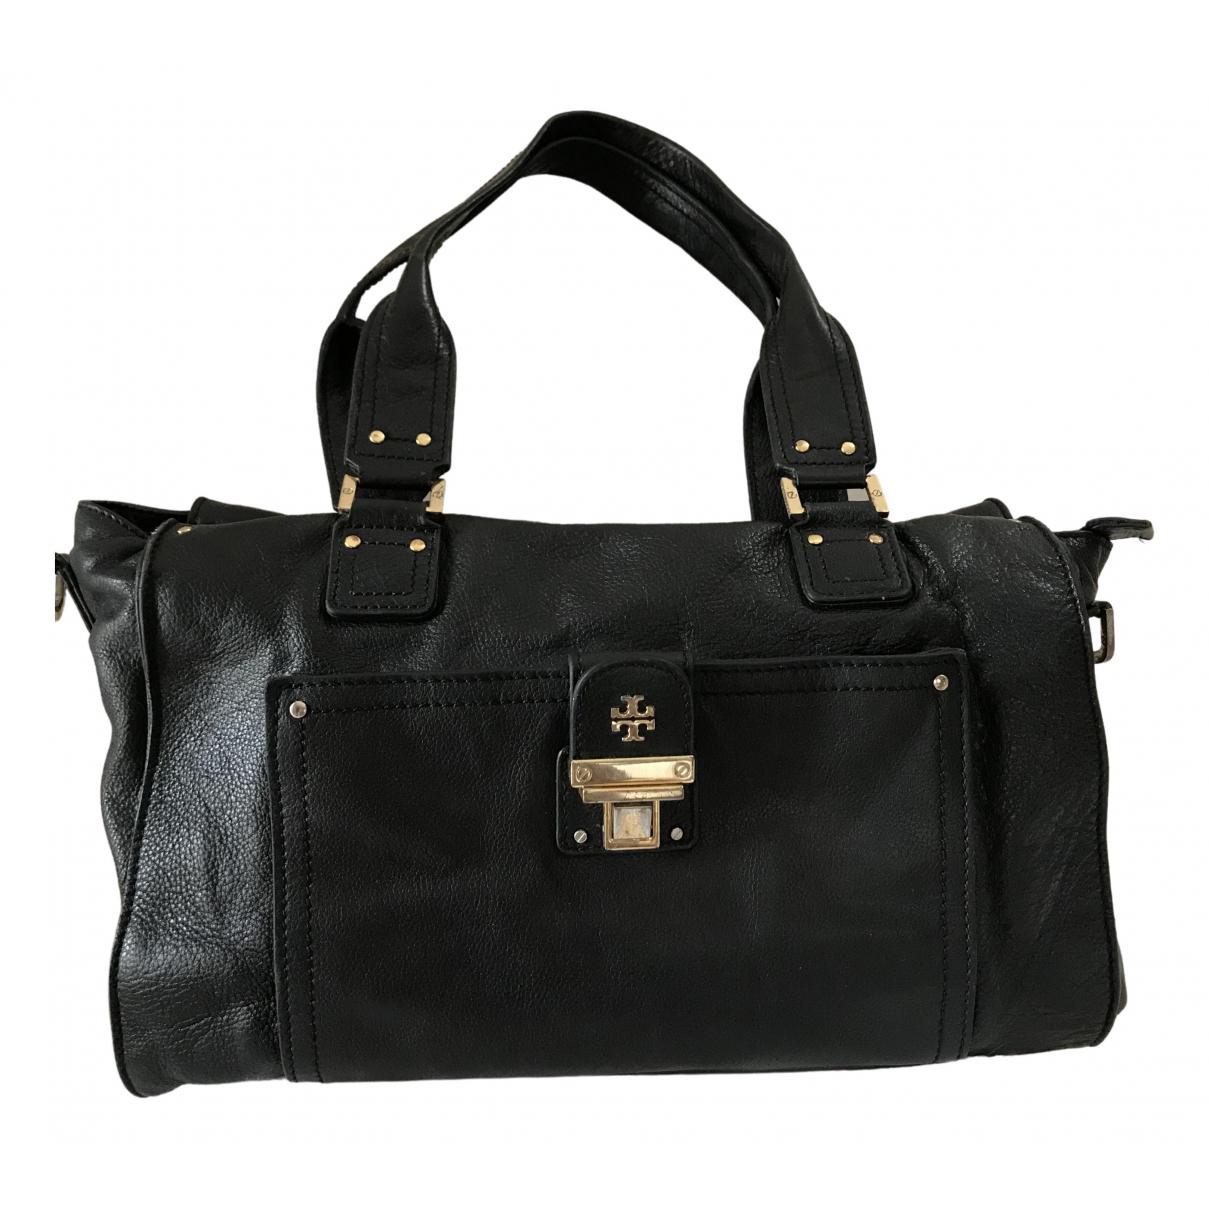 Tory Burch \N Black Leather handbag for Women \N